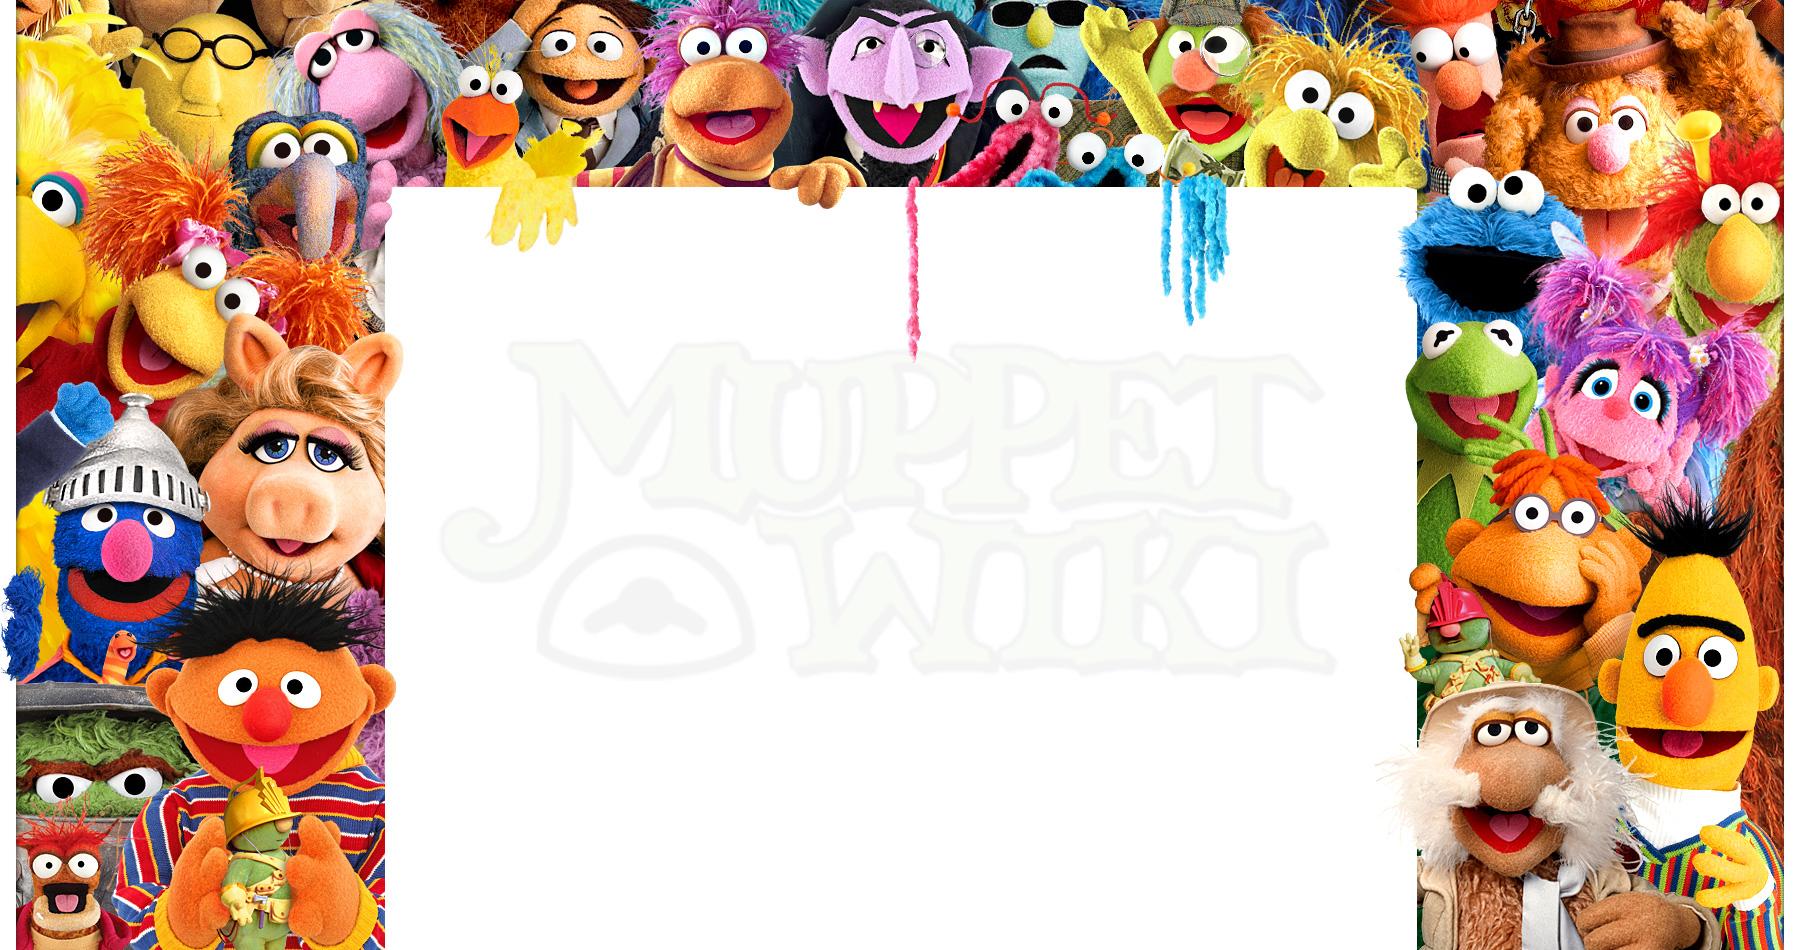 muppet wiki Gallery